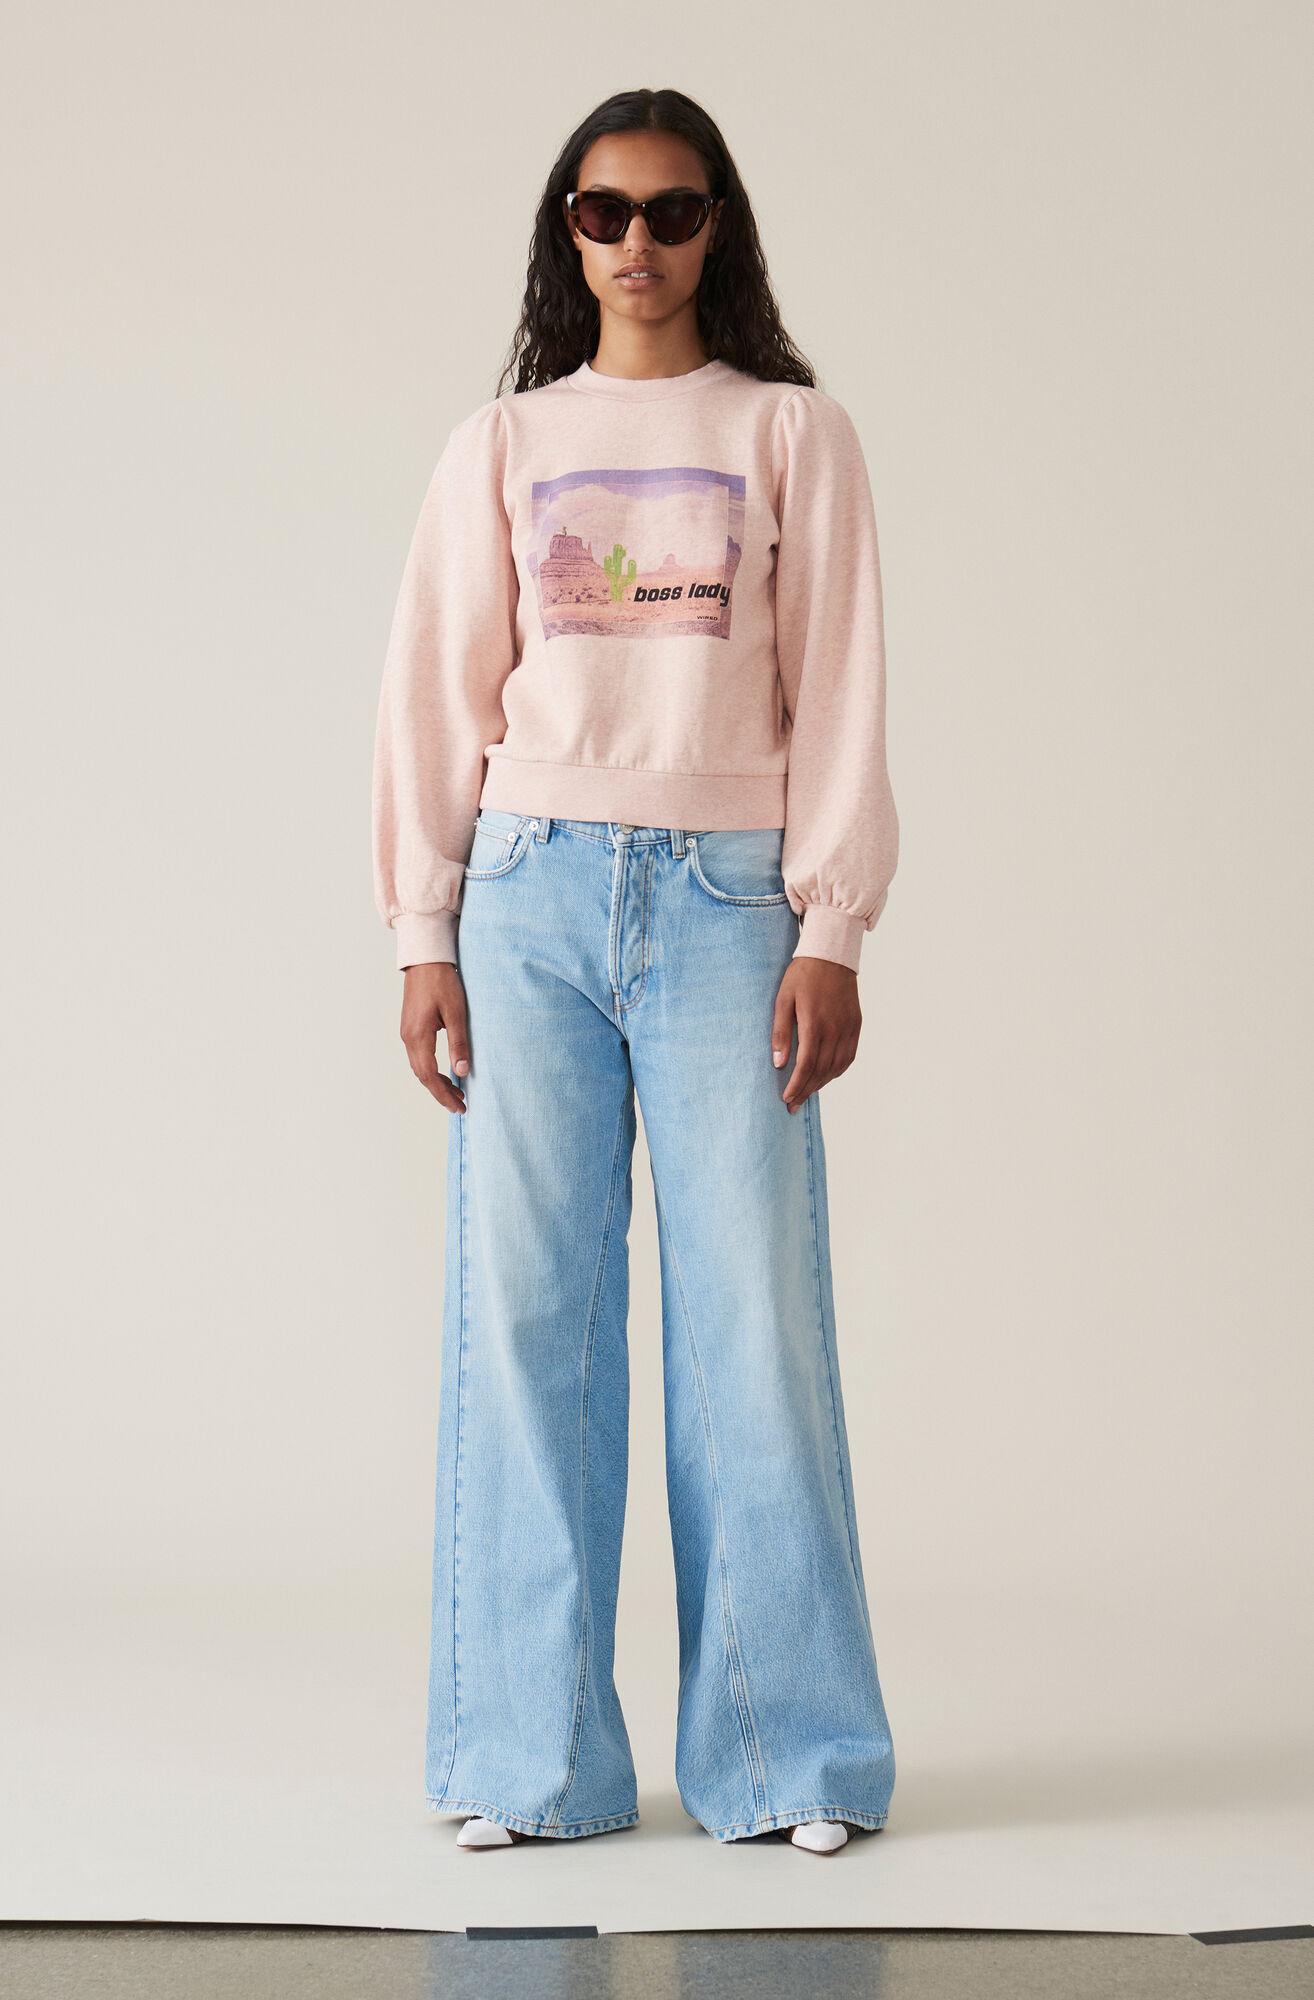 Isoli Puff Sweatshirt, Boss Lady, Silver Pink, hi-res